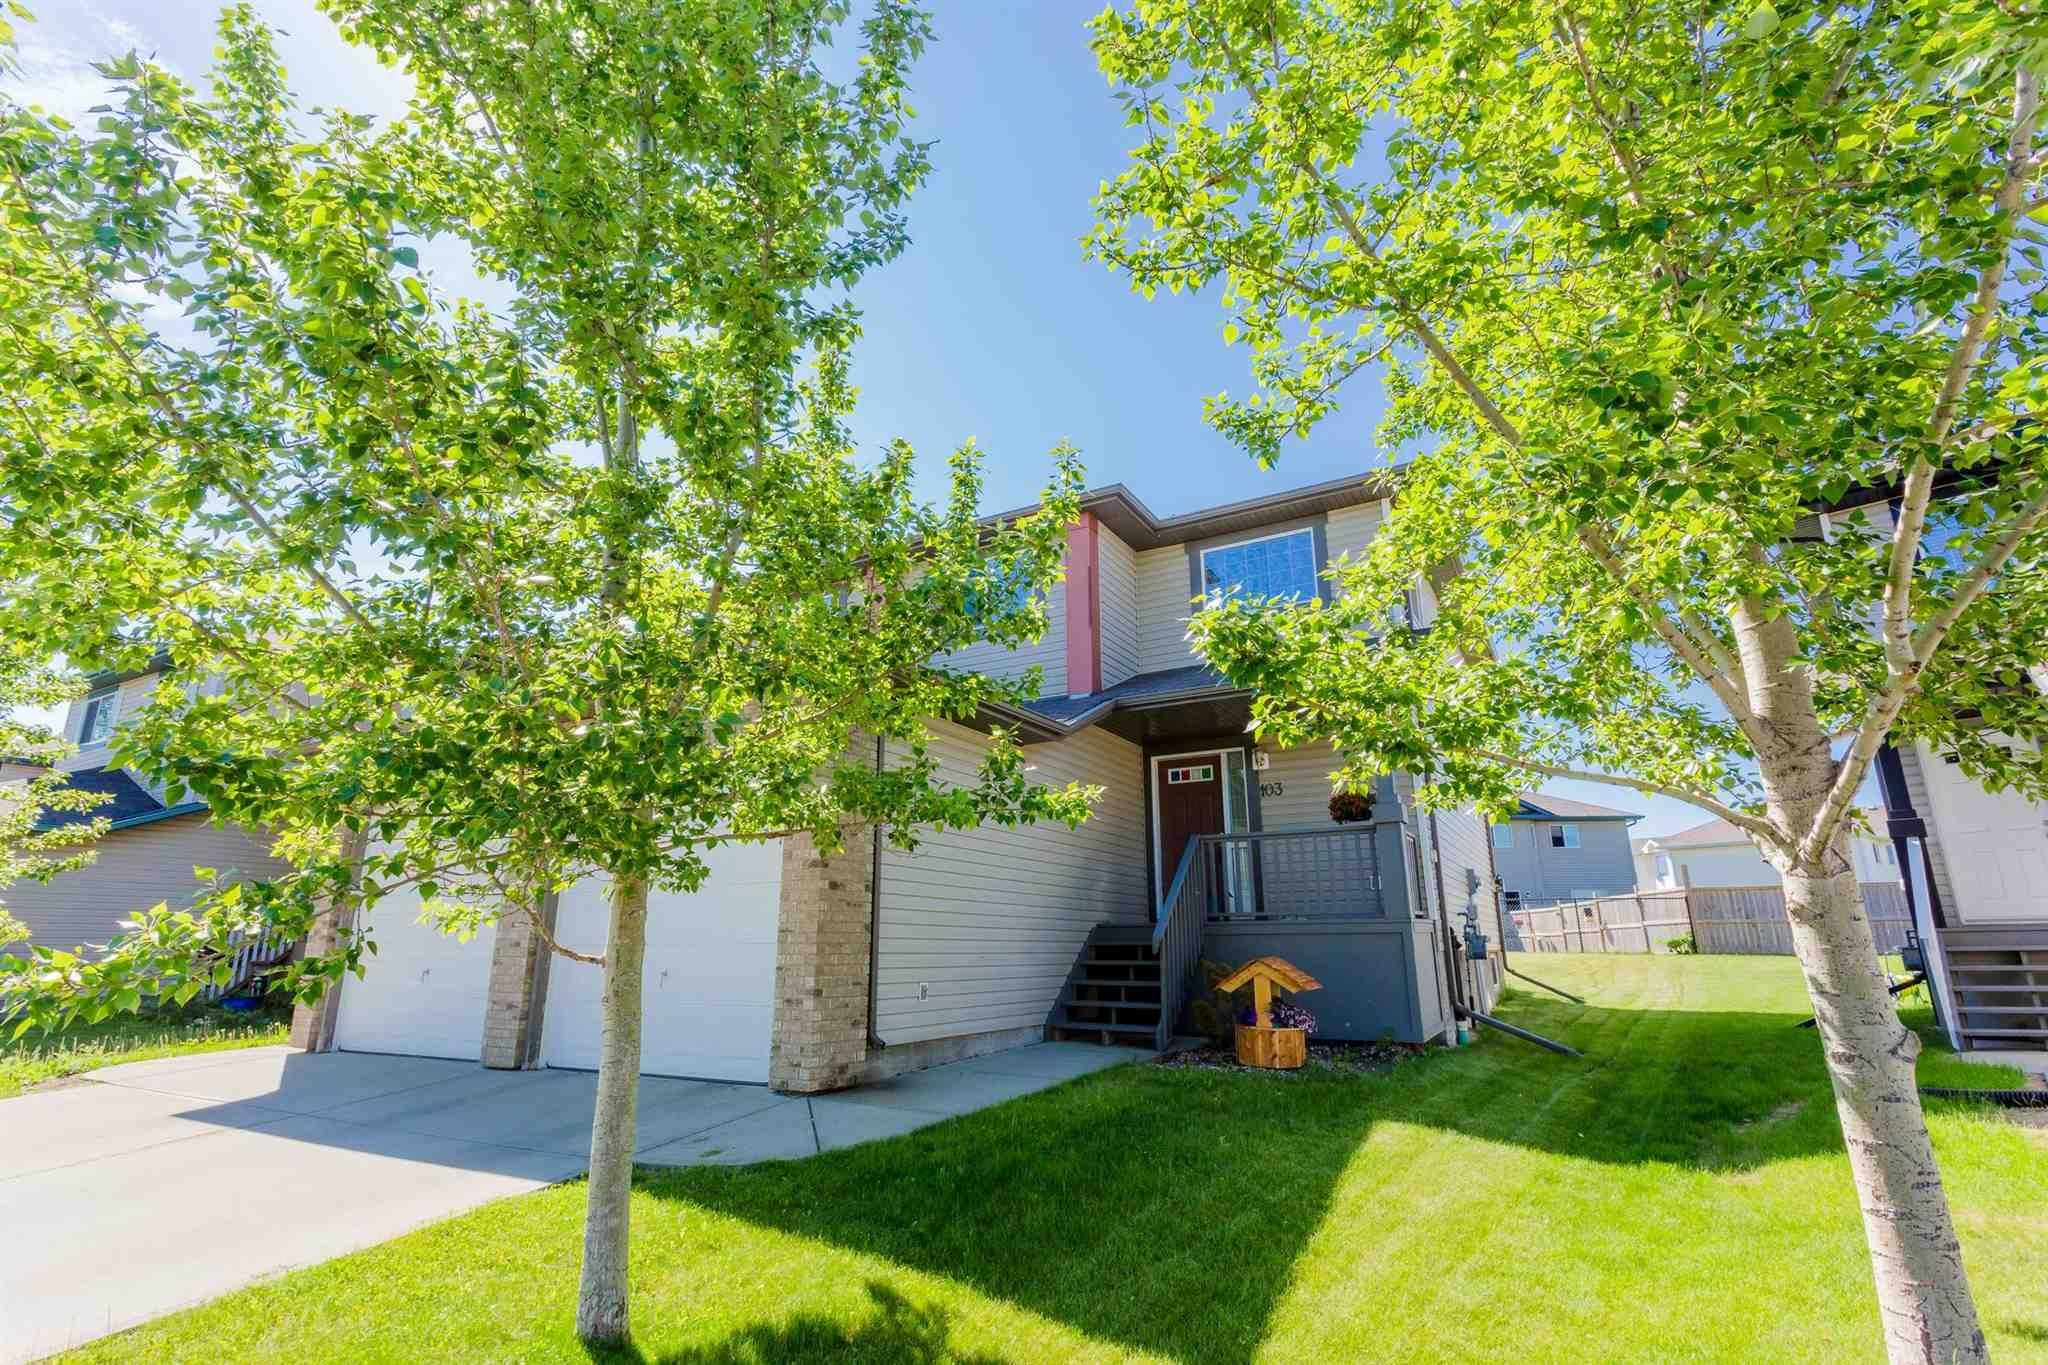 Main Photo: 103 Douglas Lane: Leduc House Half Duplex for sale : MLS®# E4235868